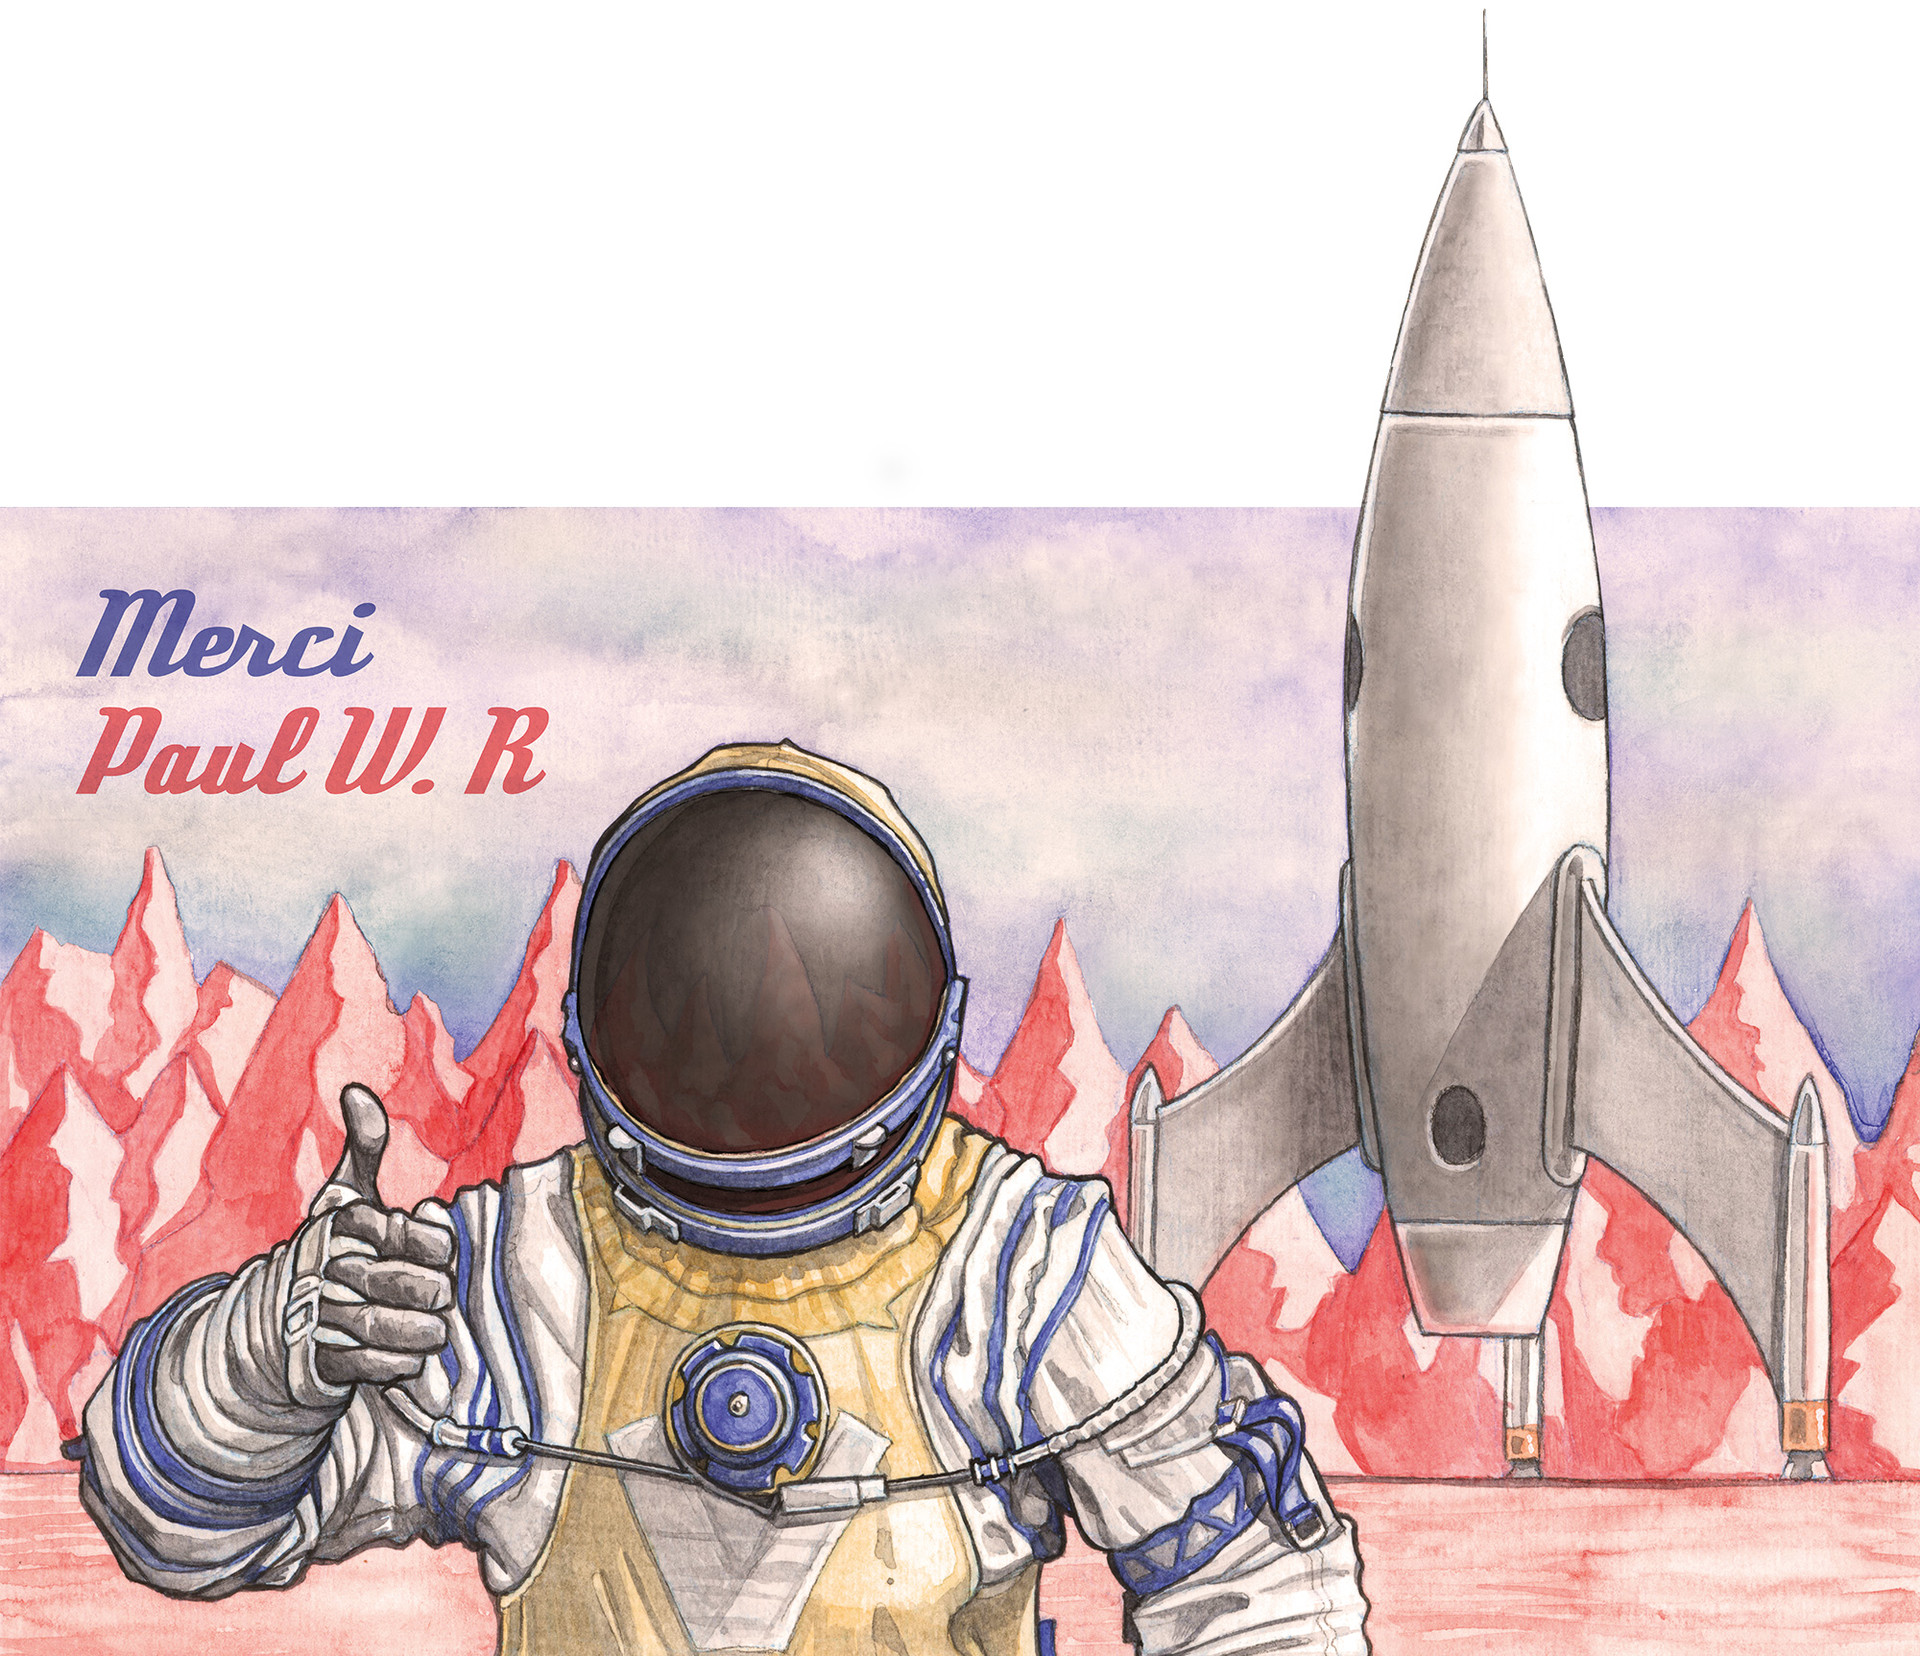 Signarbieux nicolas paul wr illustration1